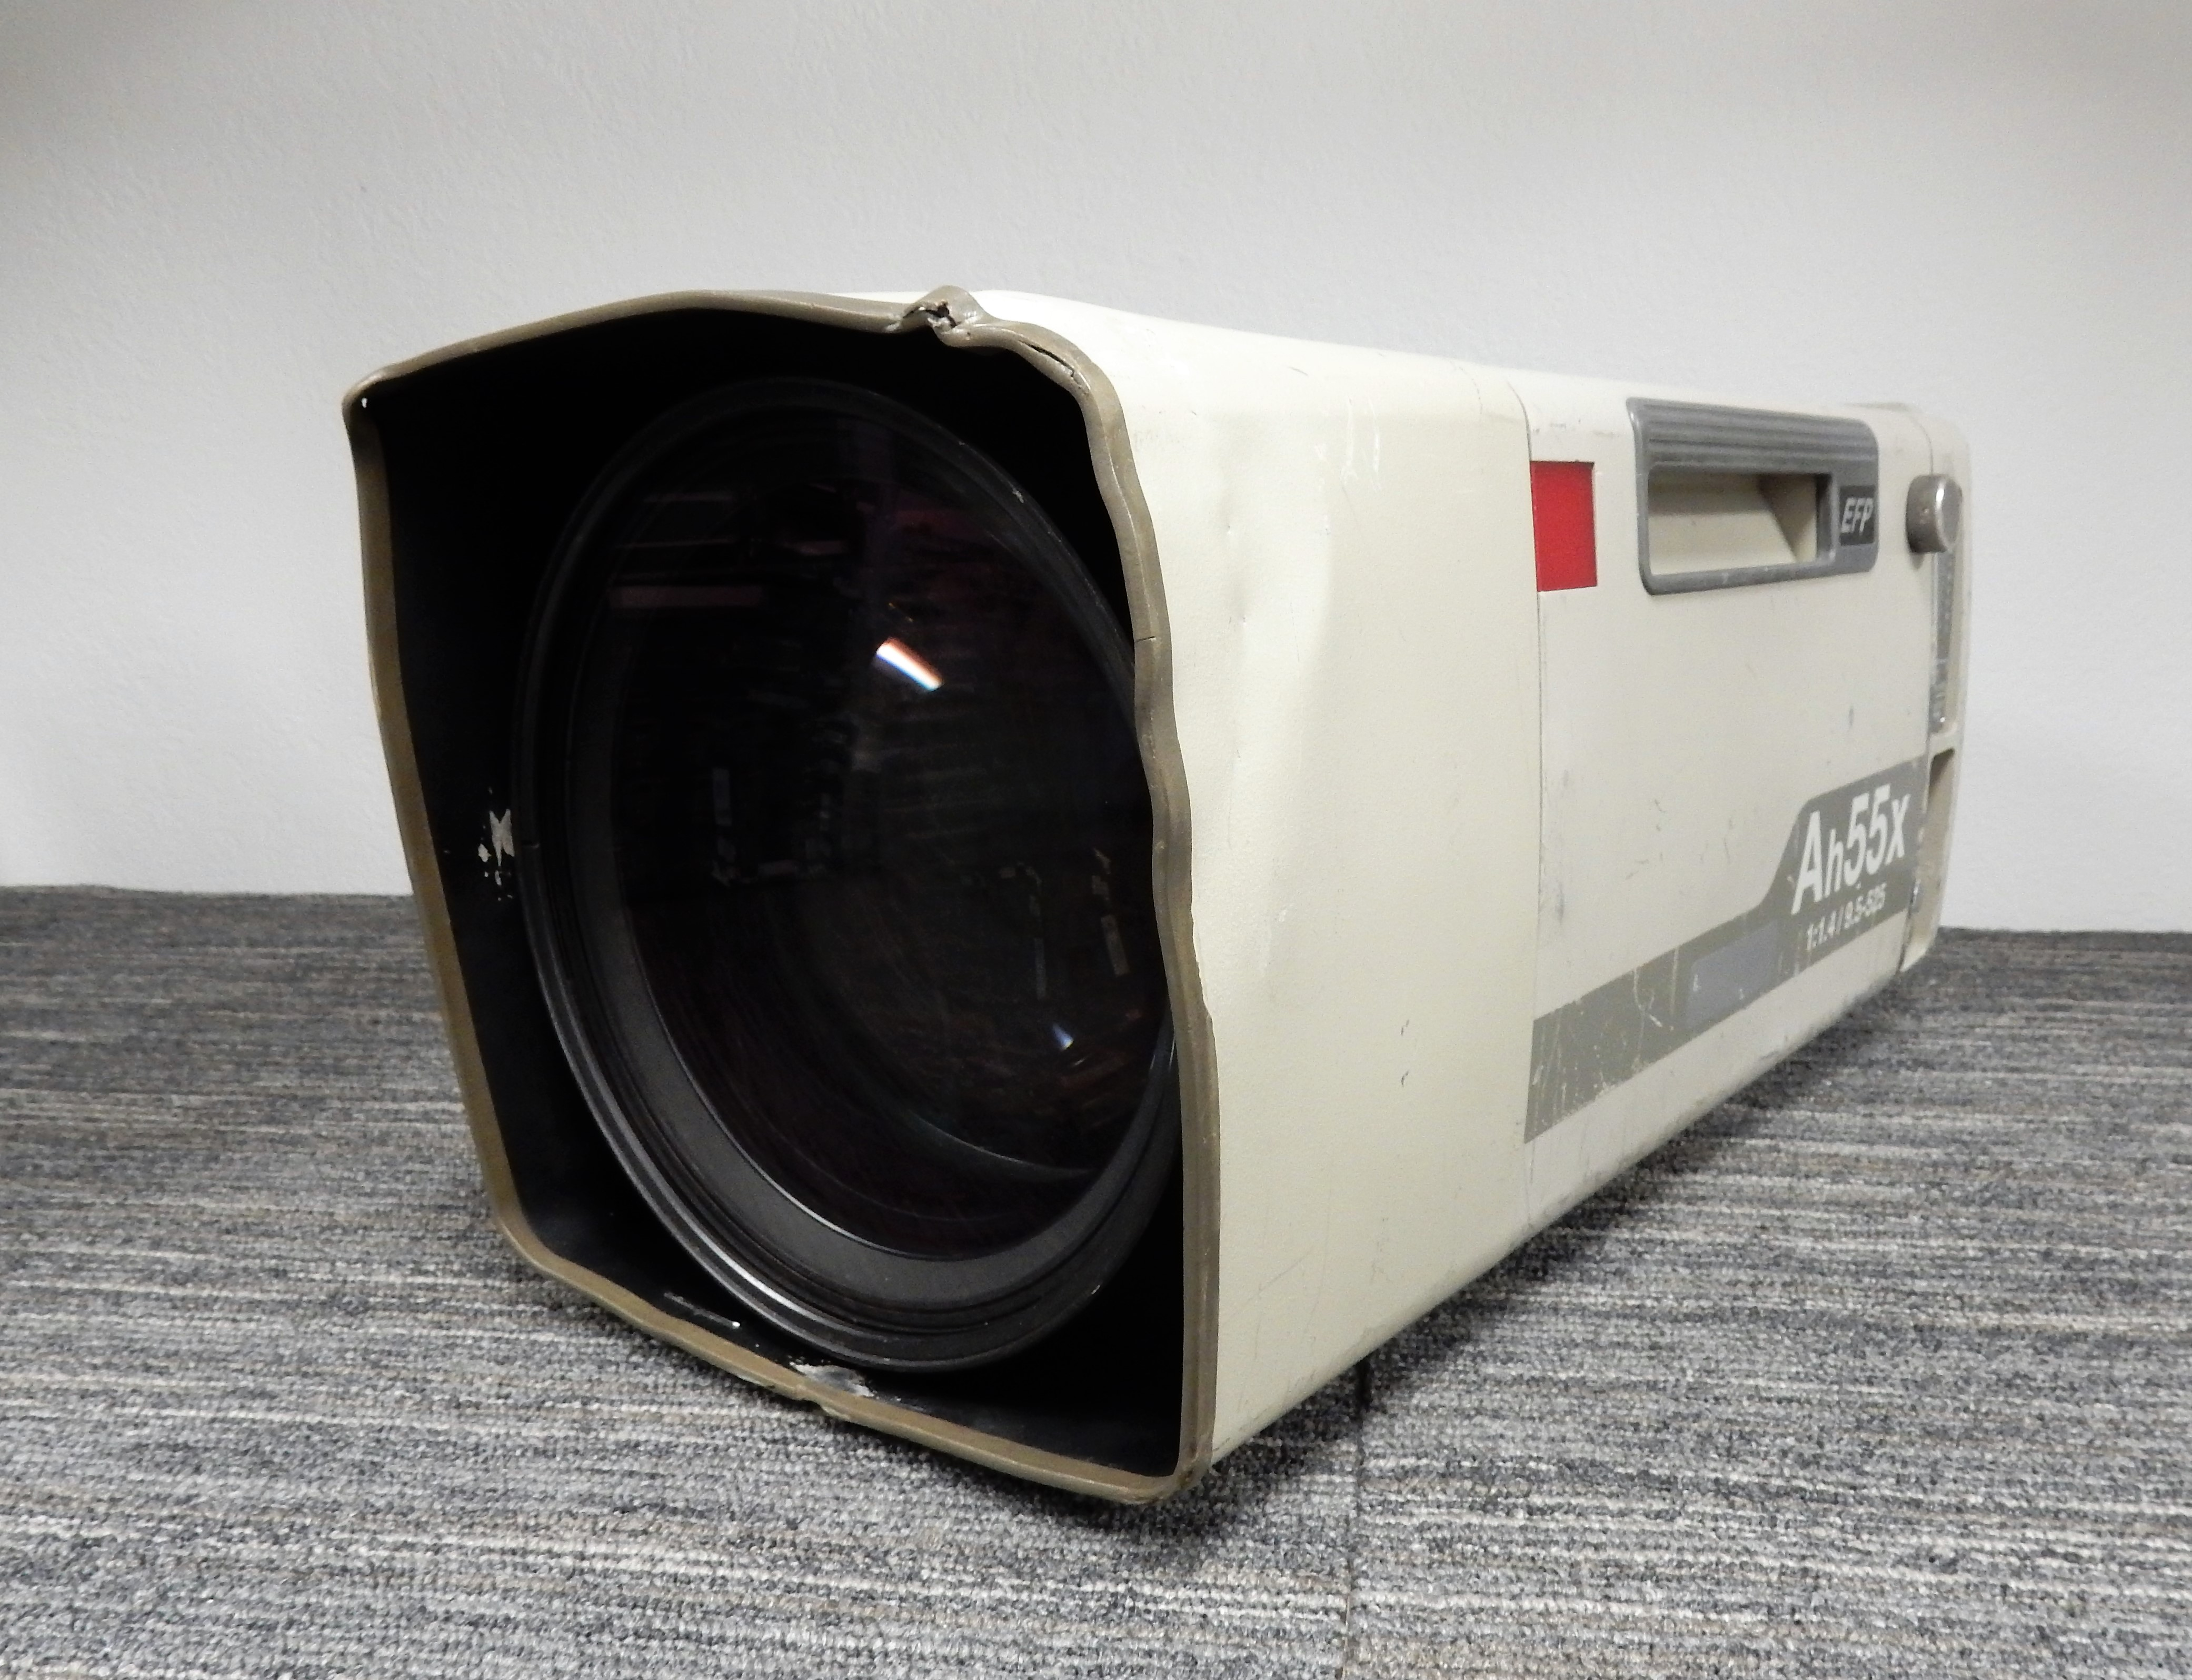 Fujinon Ah55x Lens